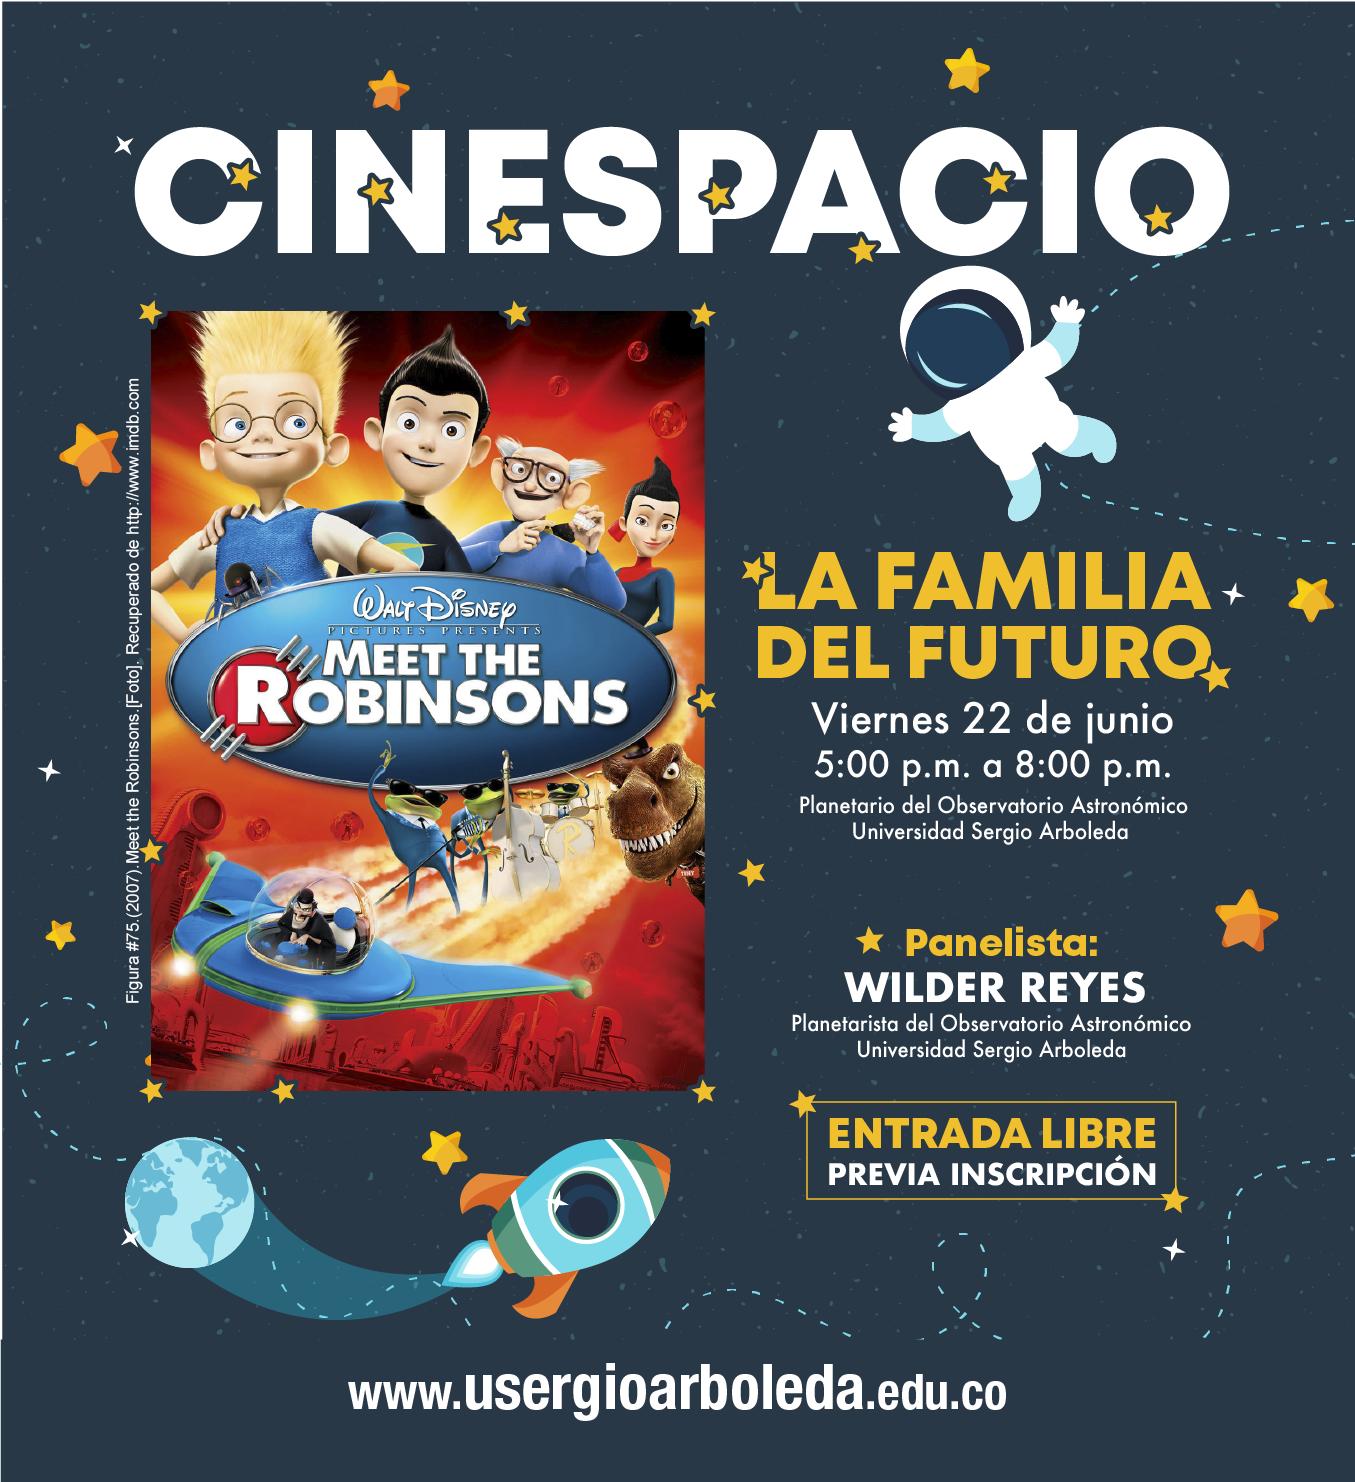 Cinespaciofamiliadelfuturo_redes-02